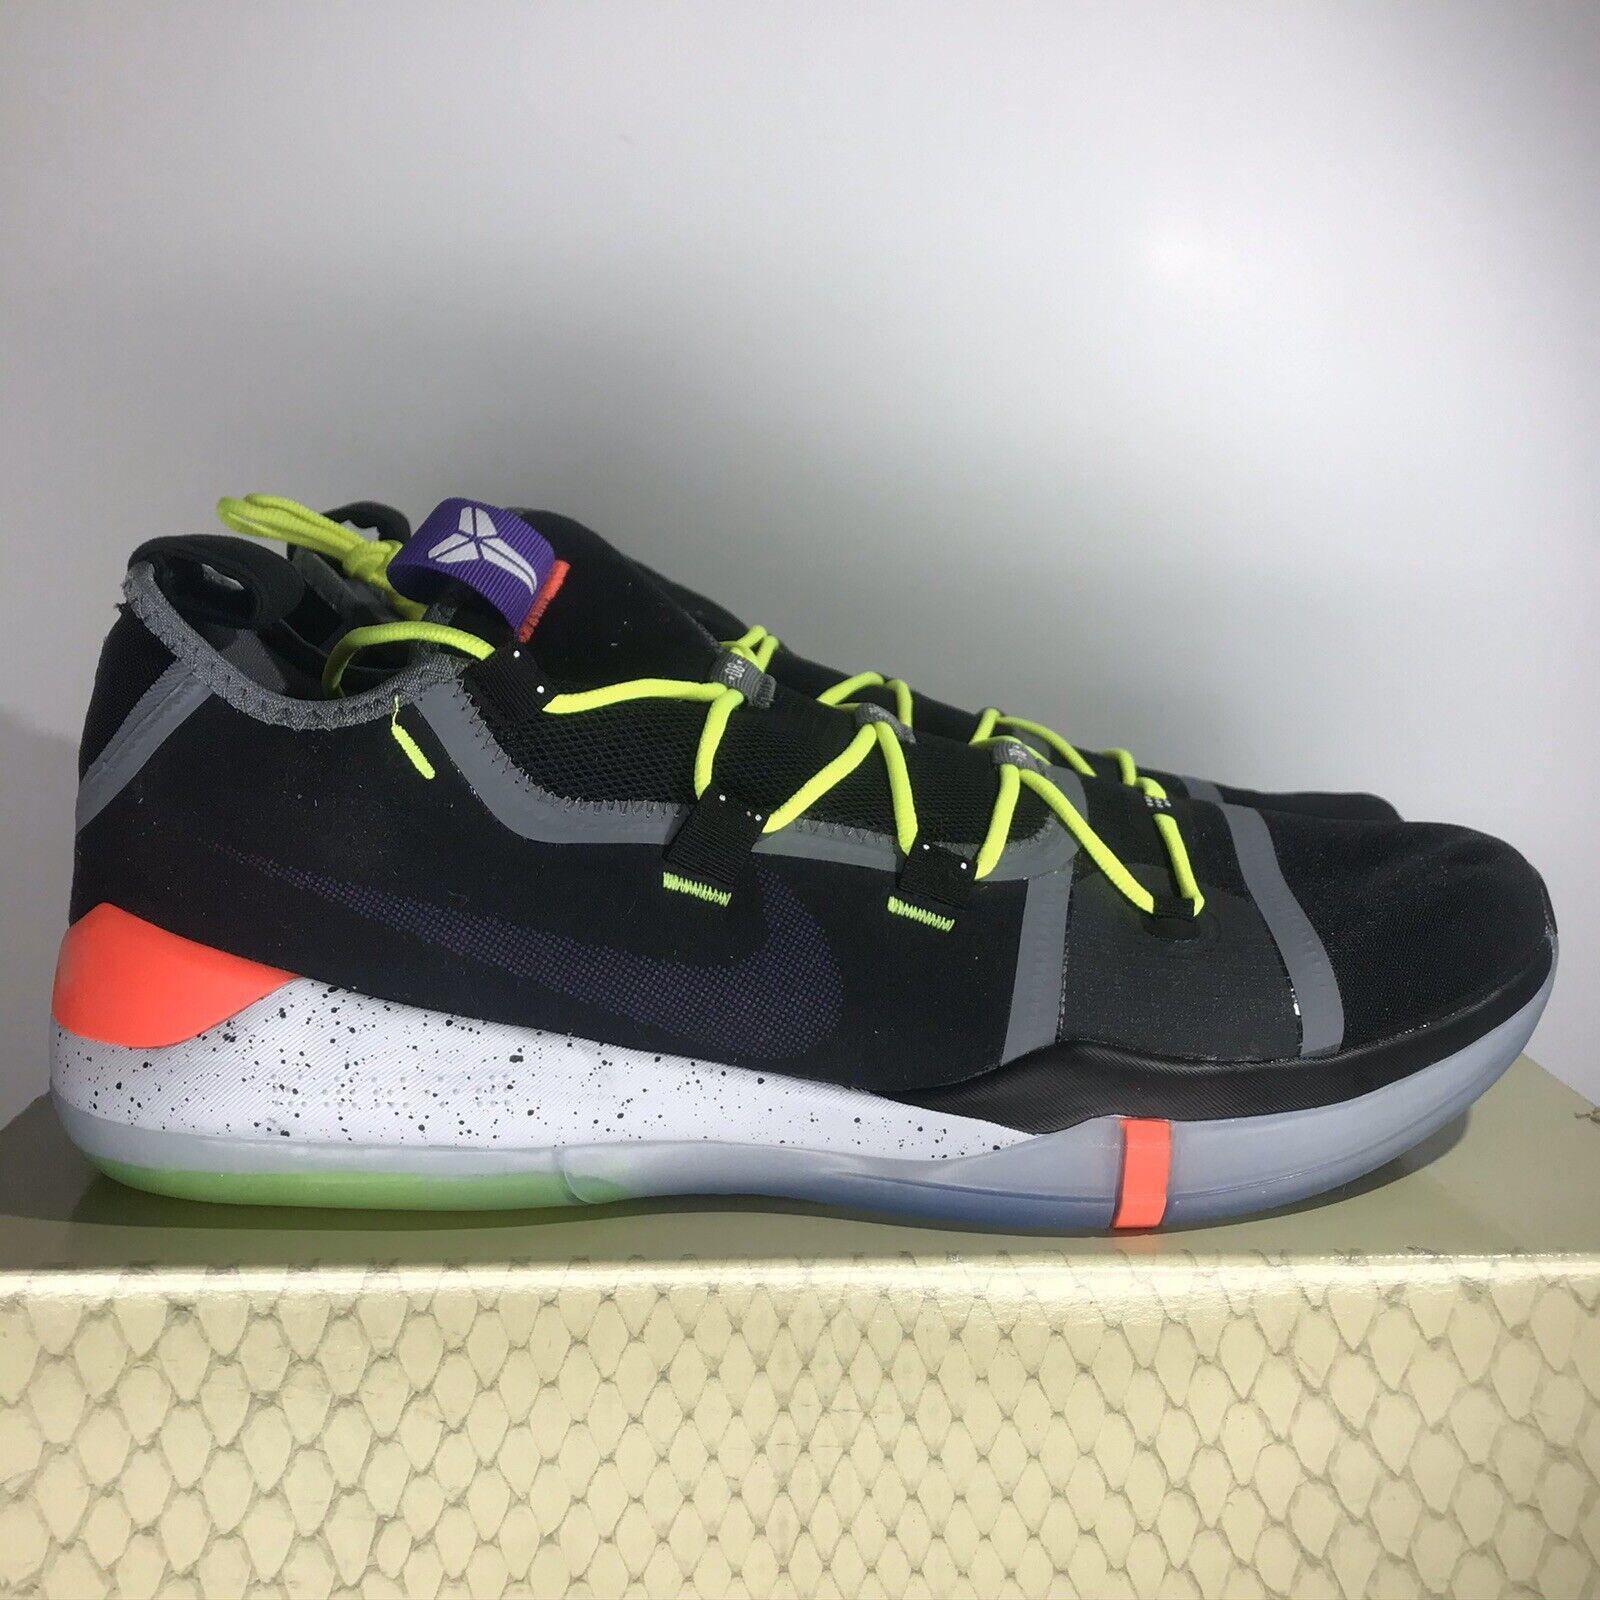 Nike Kobe AD Chaos Black Racer Blue